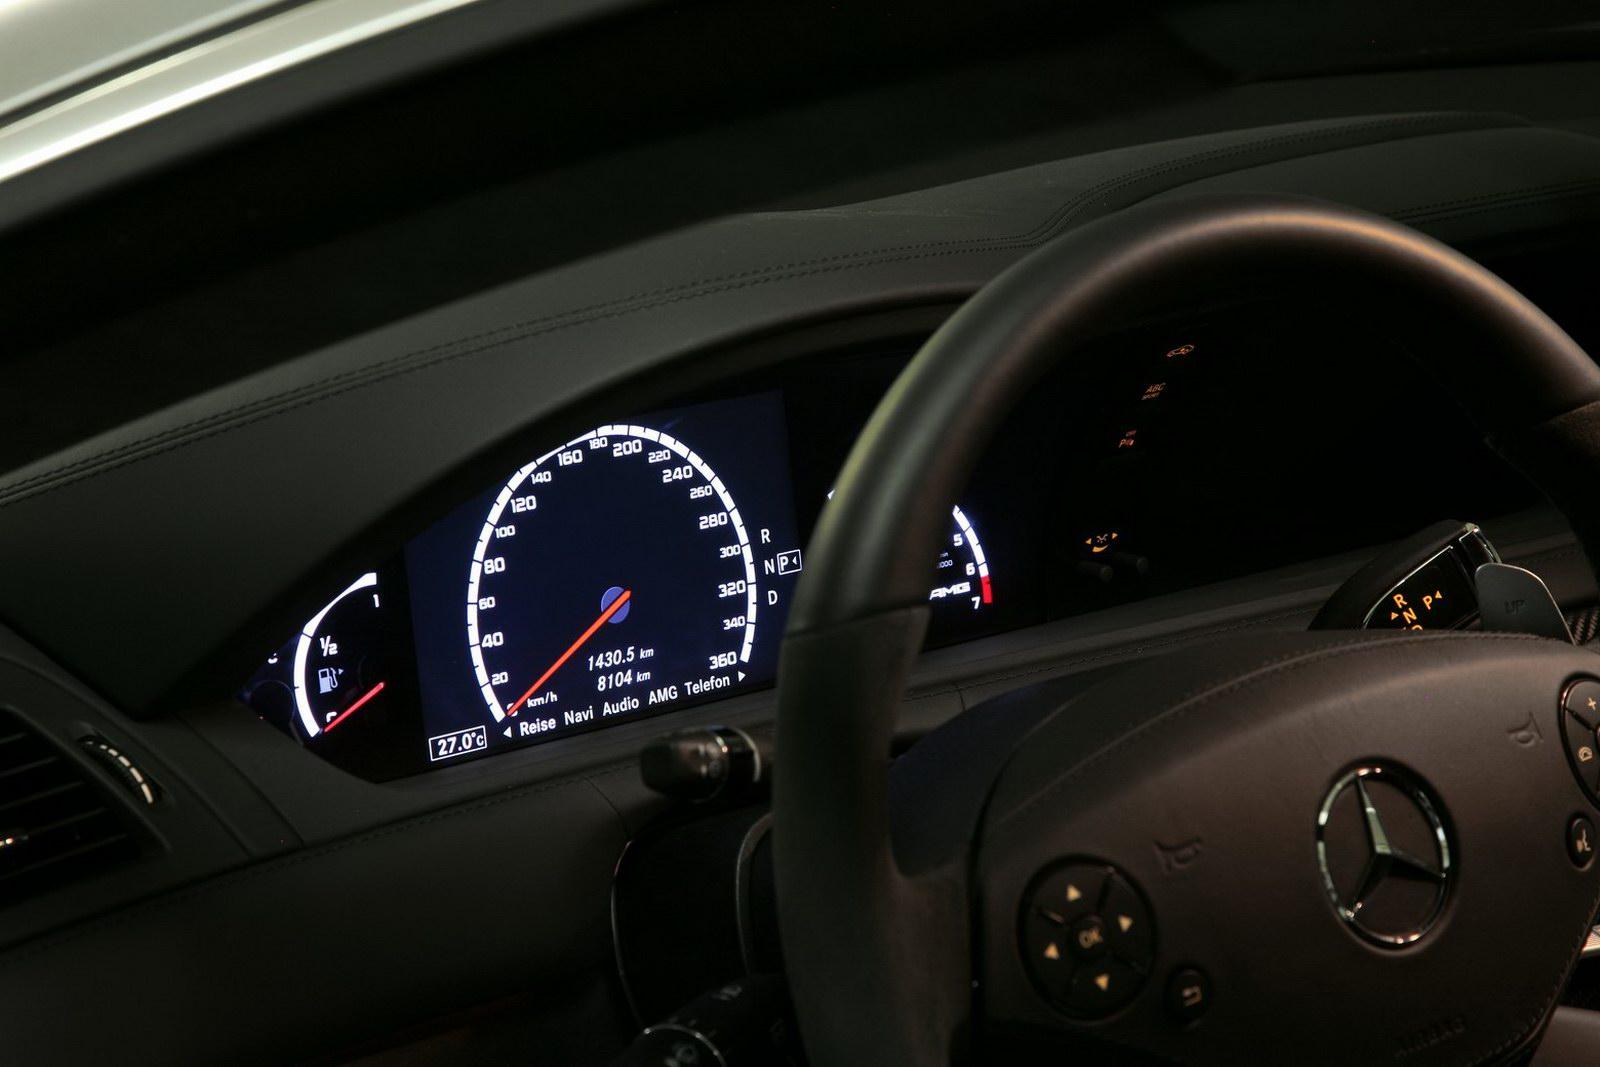 Mercedes-Bent CL 63 AMG a nárust výkonu od Väth 5